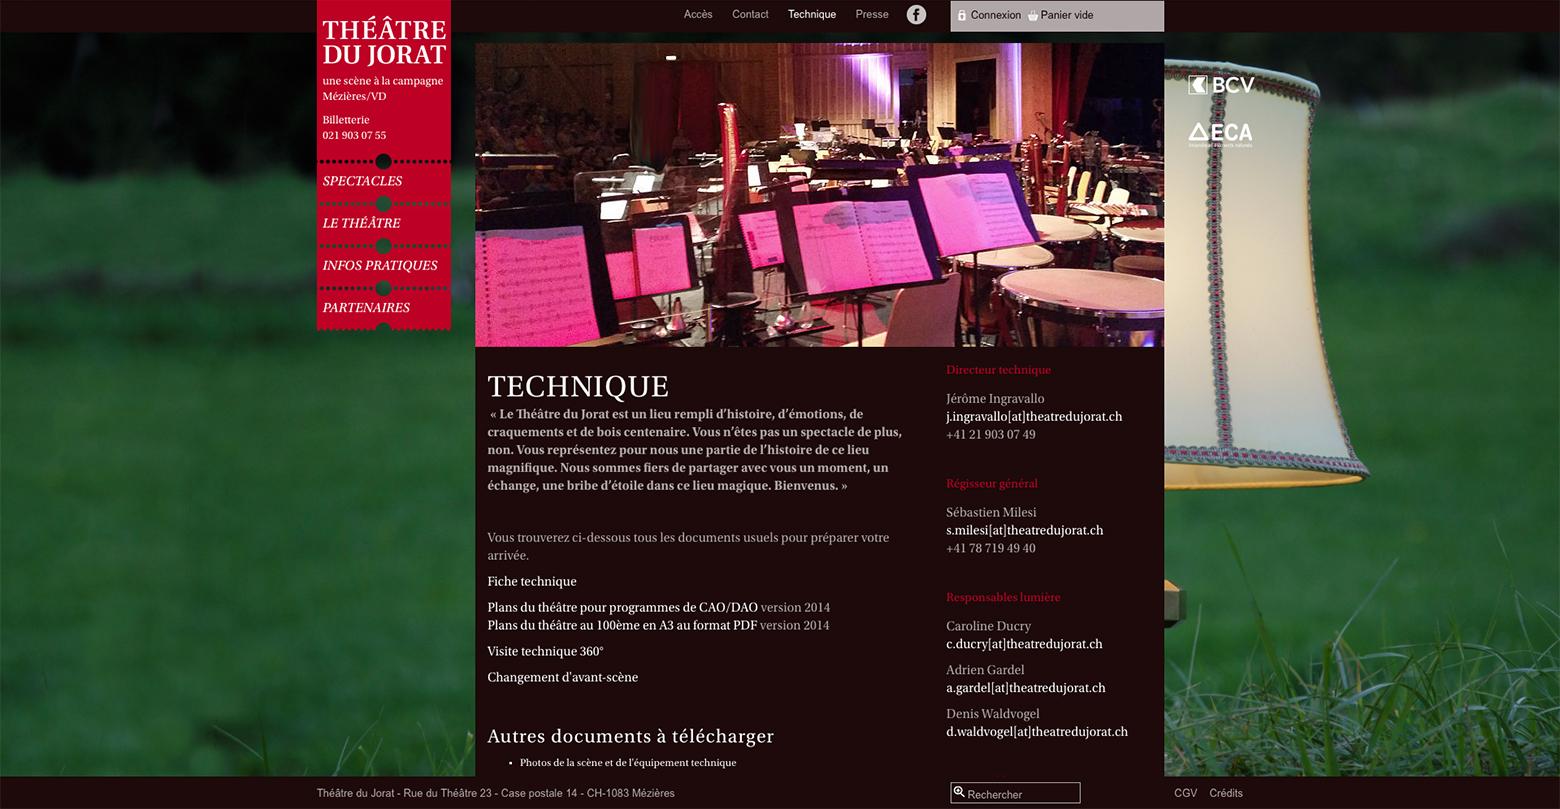 Théâtre du Jorat WNG Agence Digitale